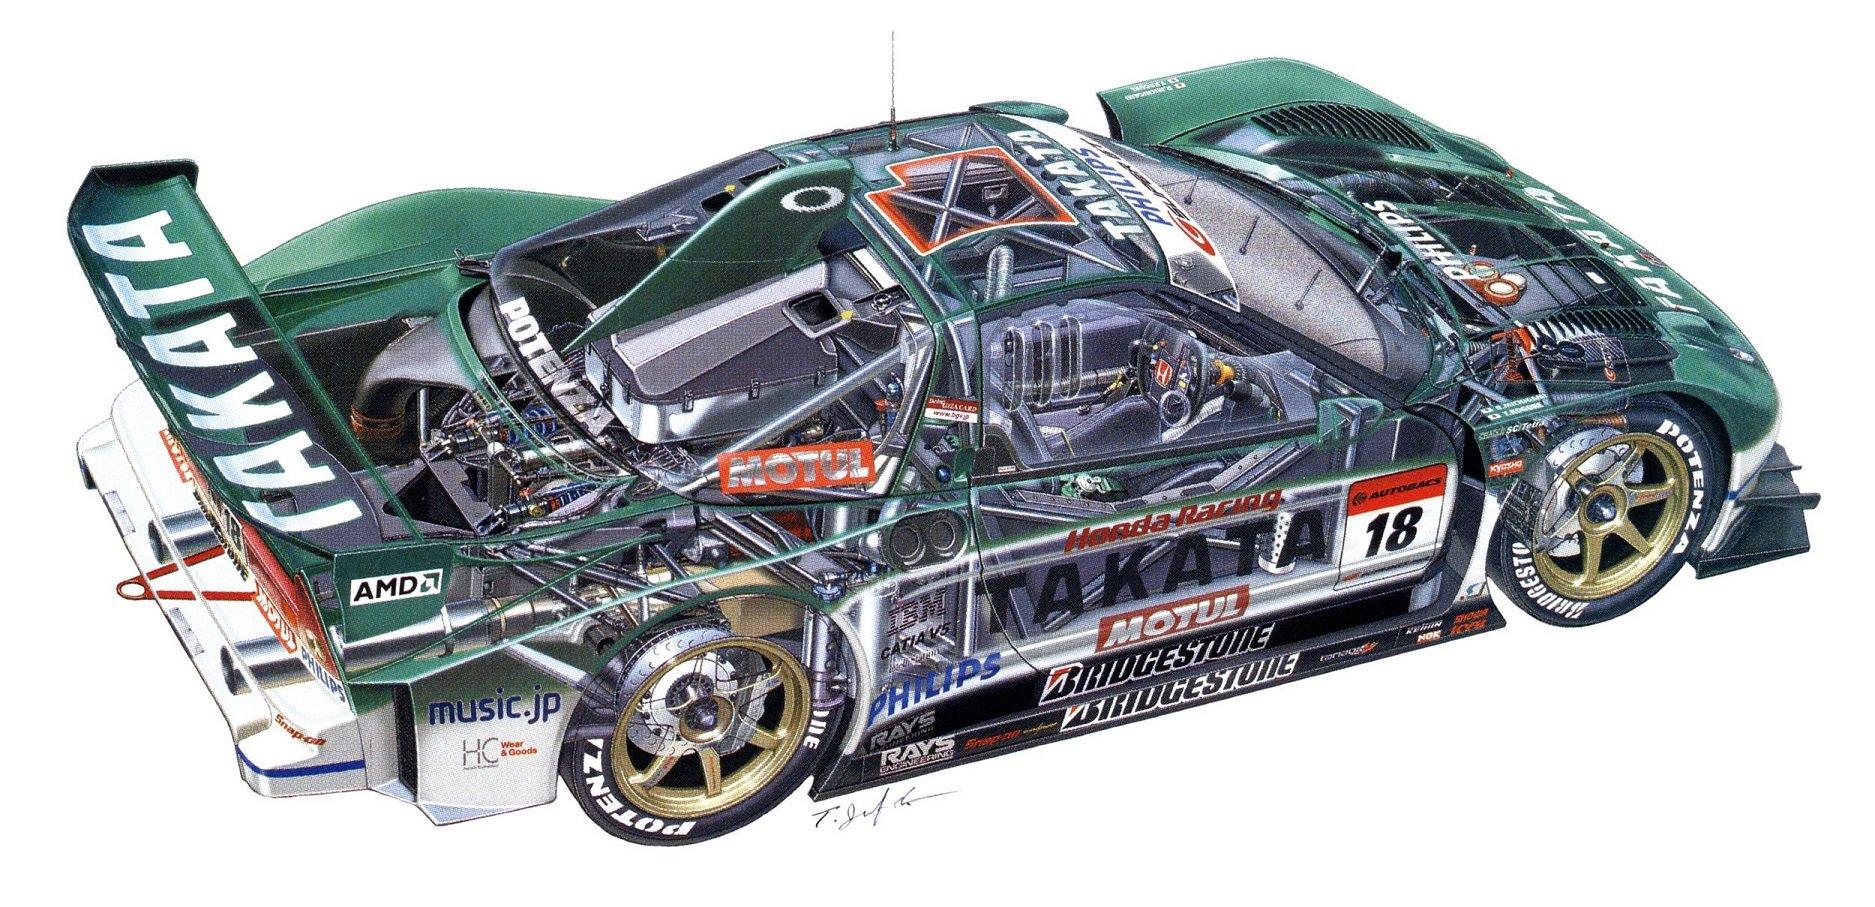 Honda Nsx Takata Dome Nsx Jgtc Super Gt Cars Racecars